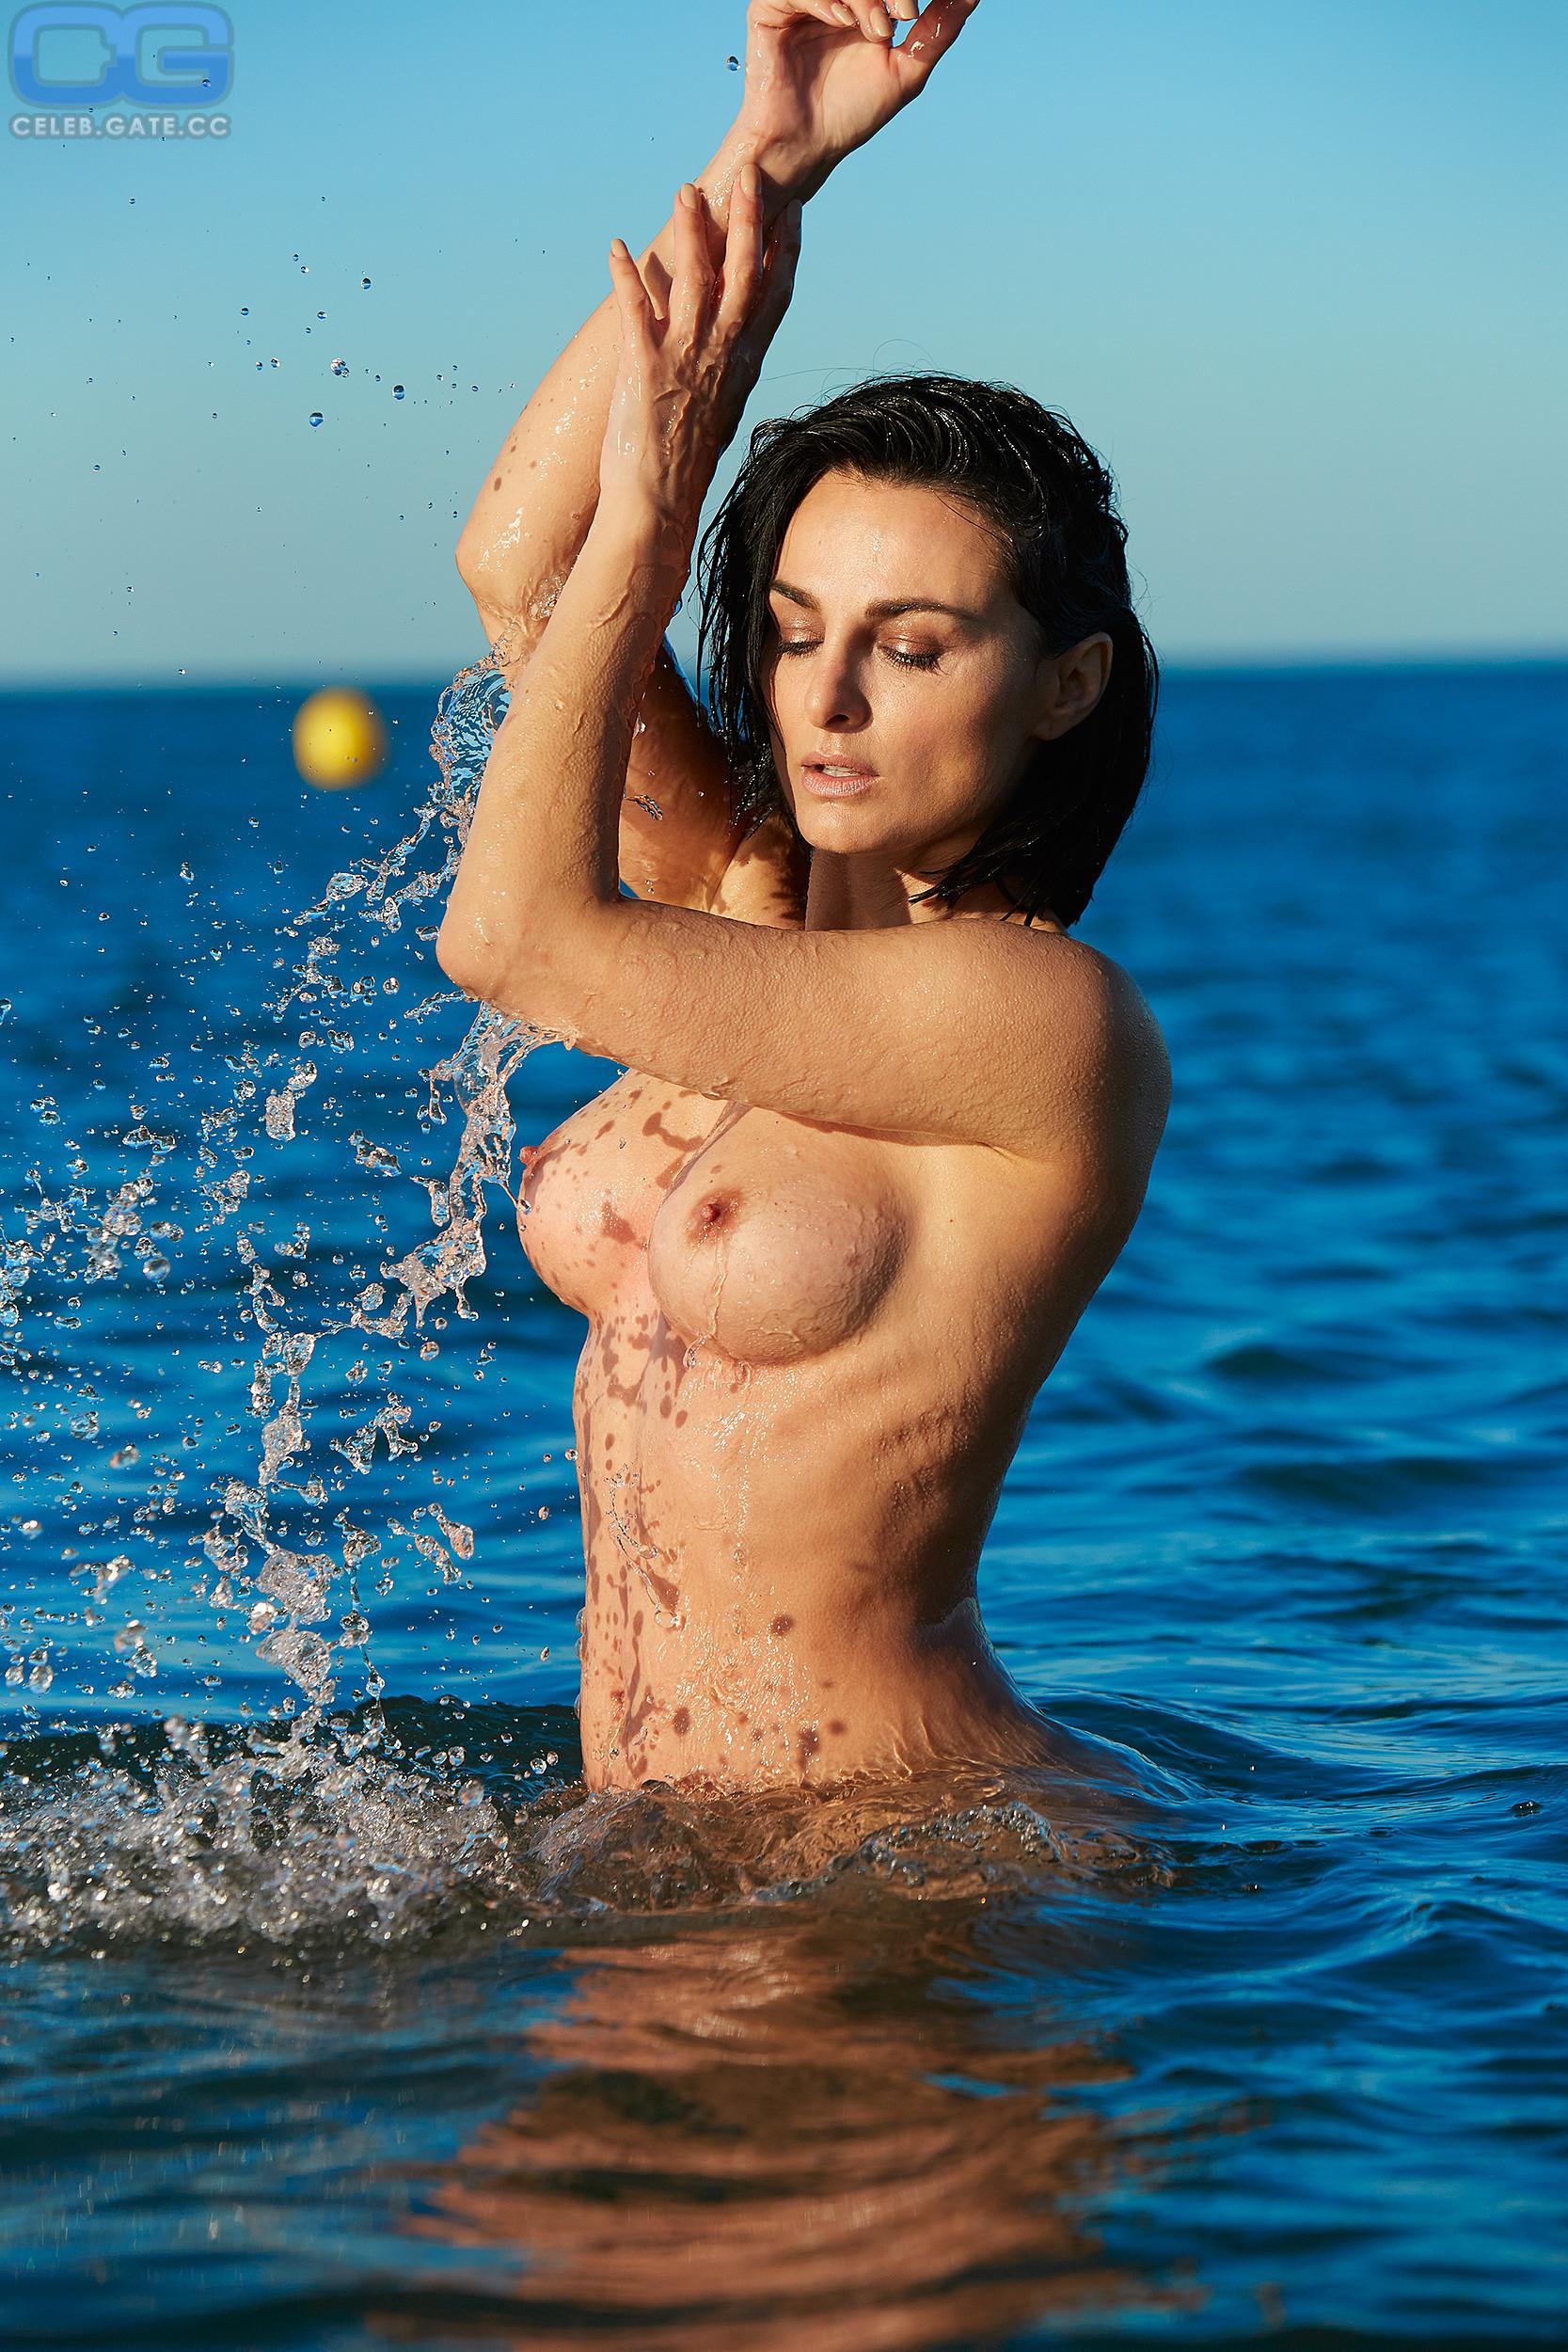 Nackt playboy fiedler mimi Mimi Fiedler